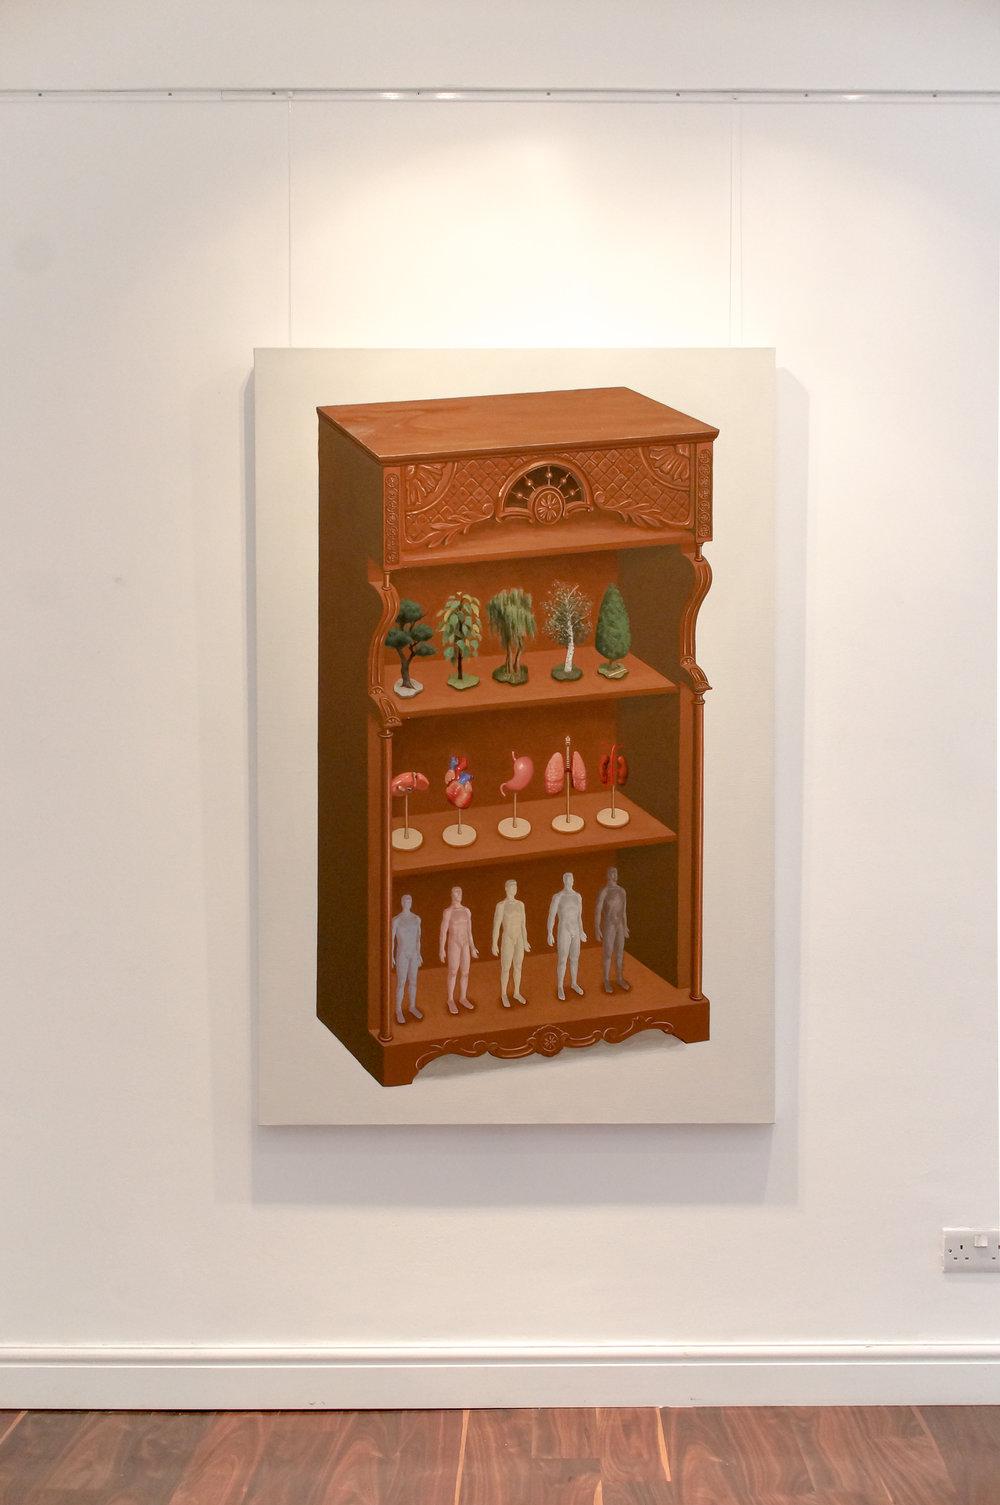 'Healthy Bureau' by Sung-kook Kim